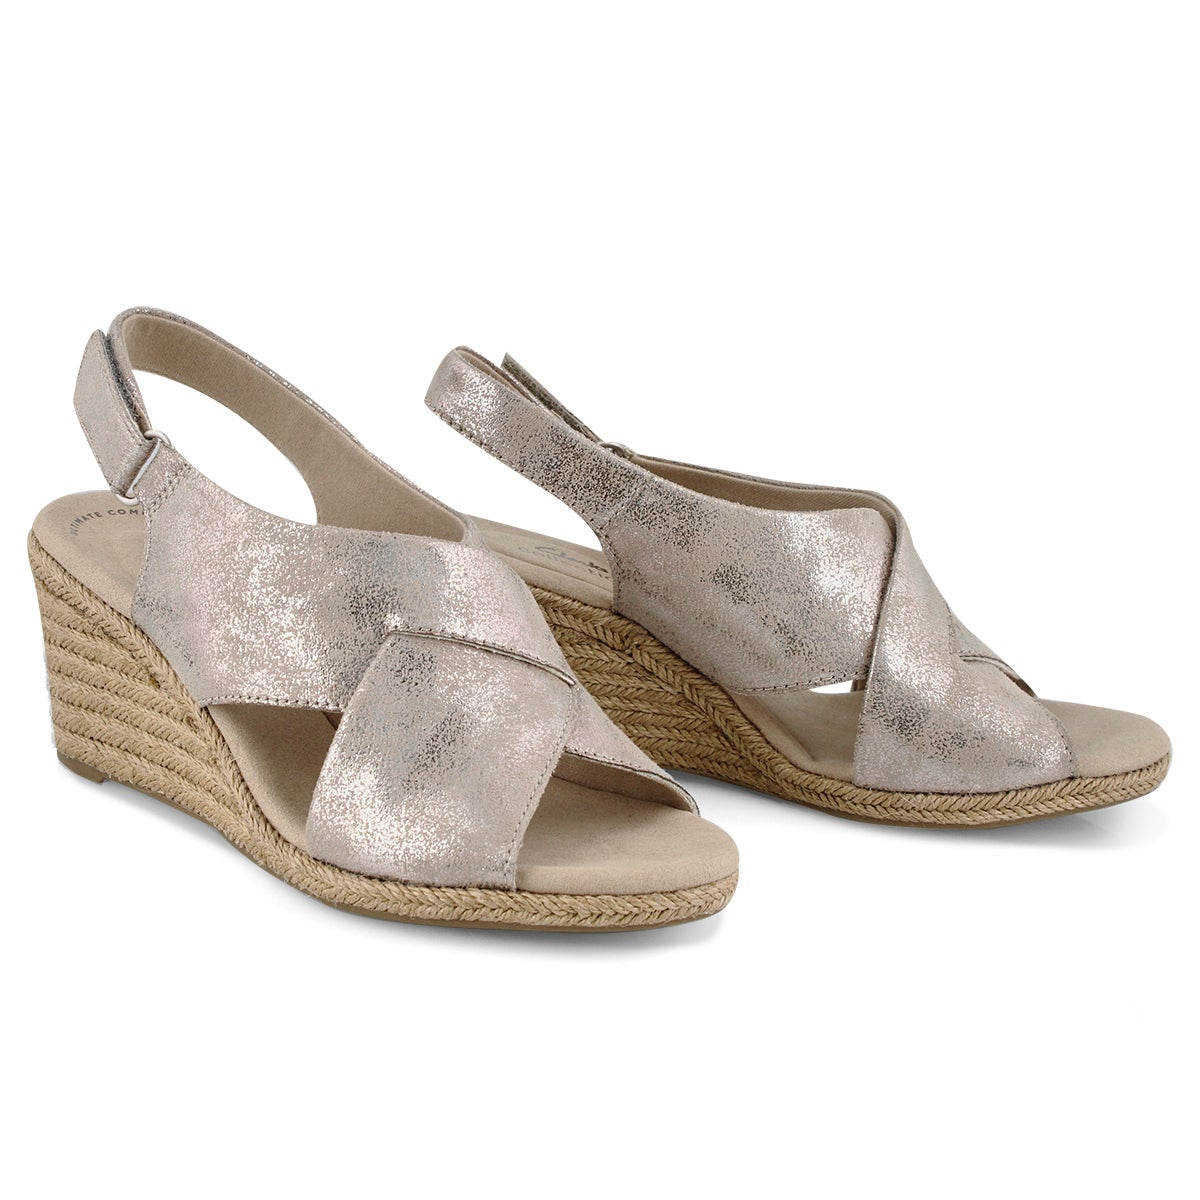 Lds Lafley Alaine pewter wedge sandal